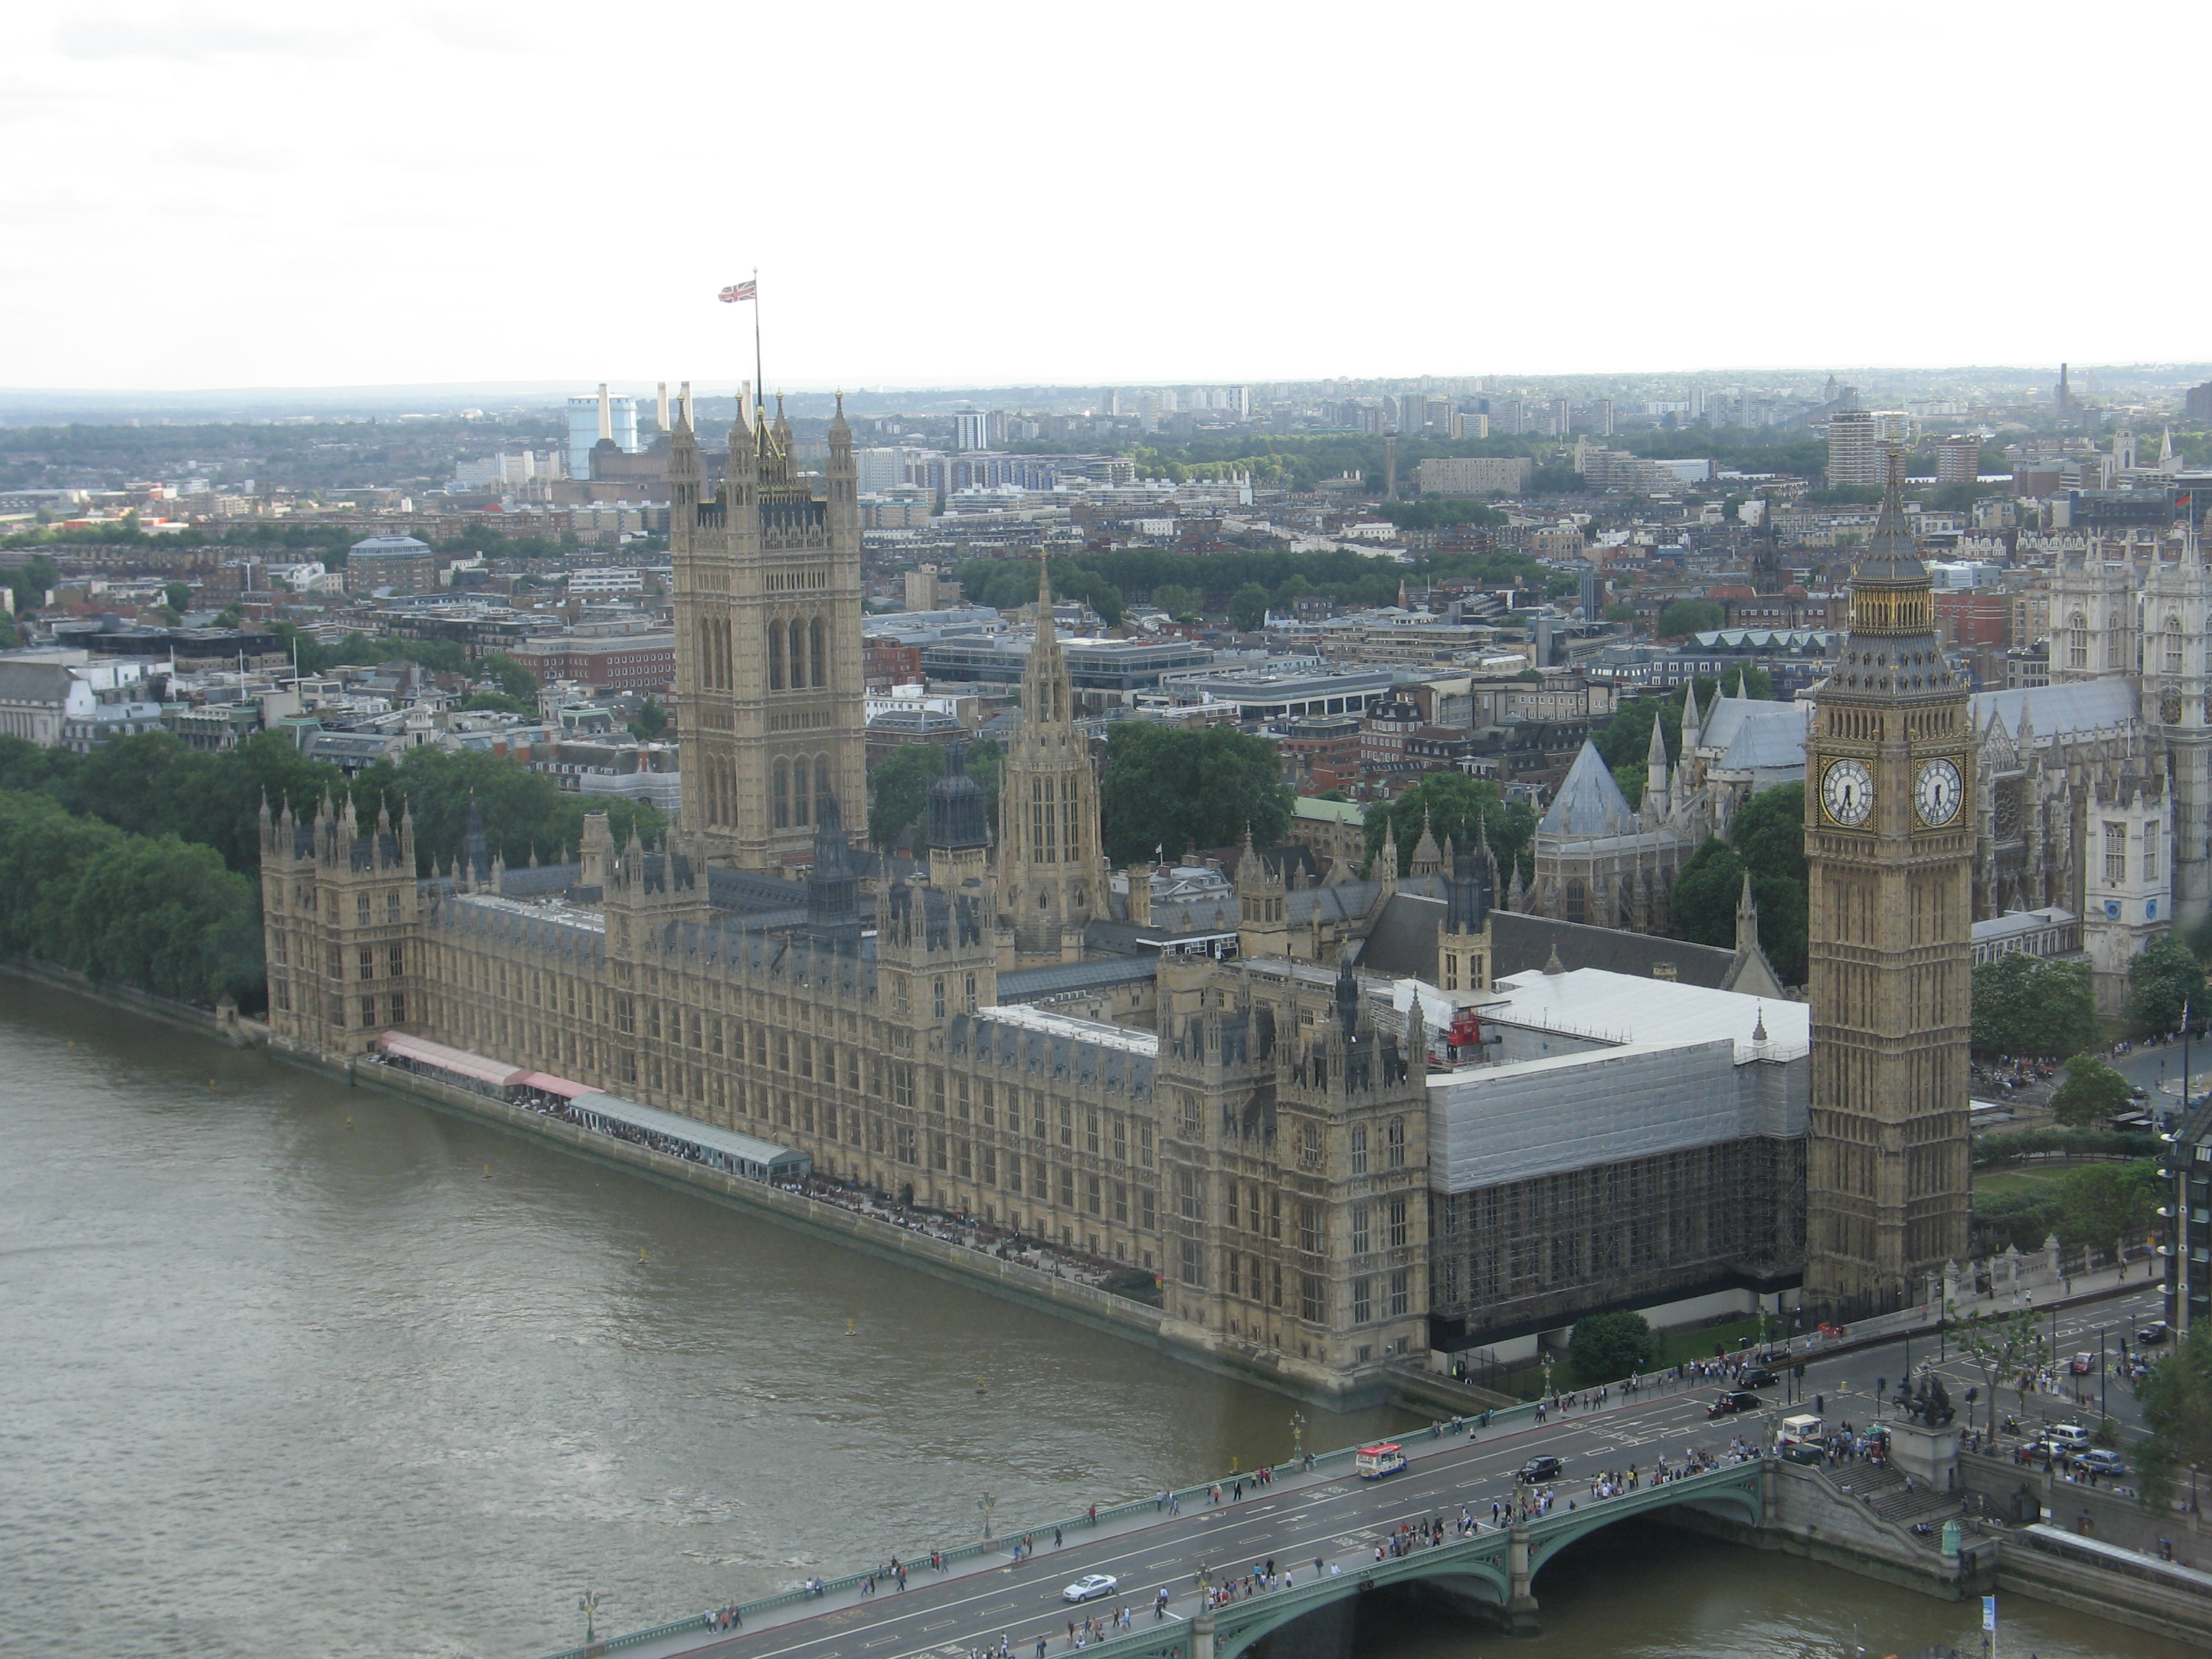 Londra (Inghilterra)